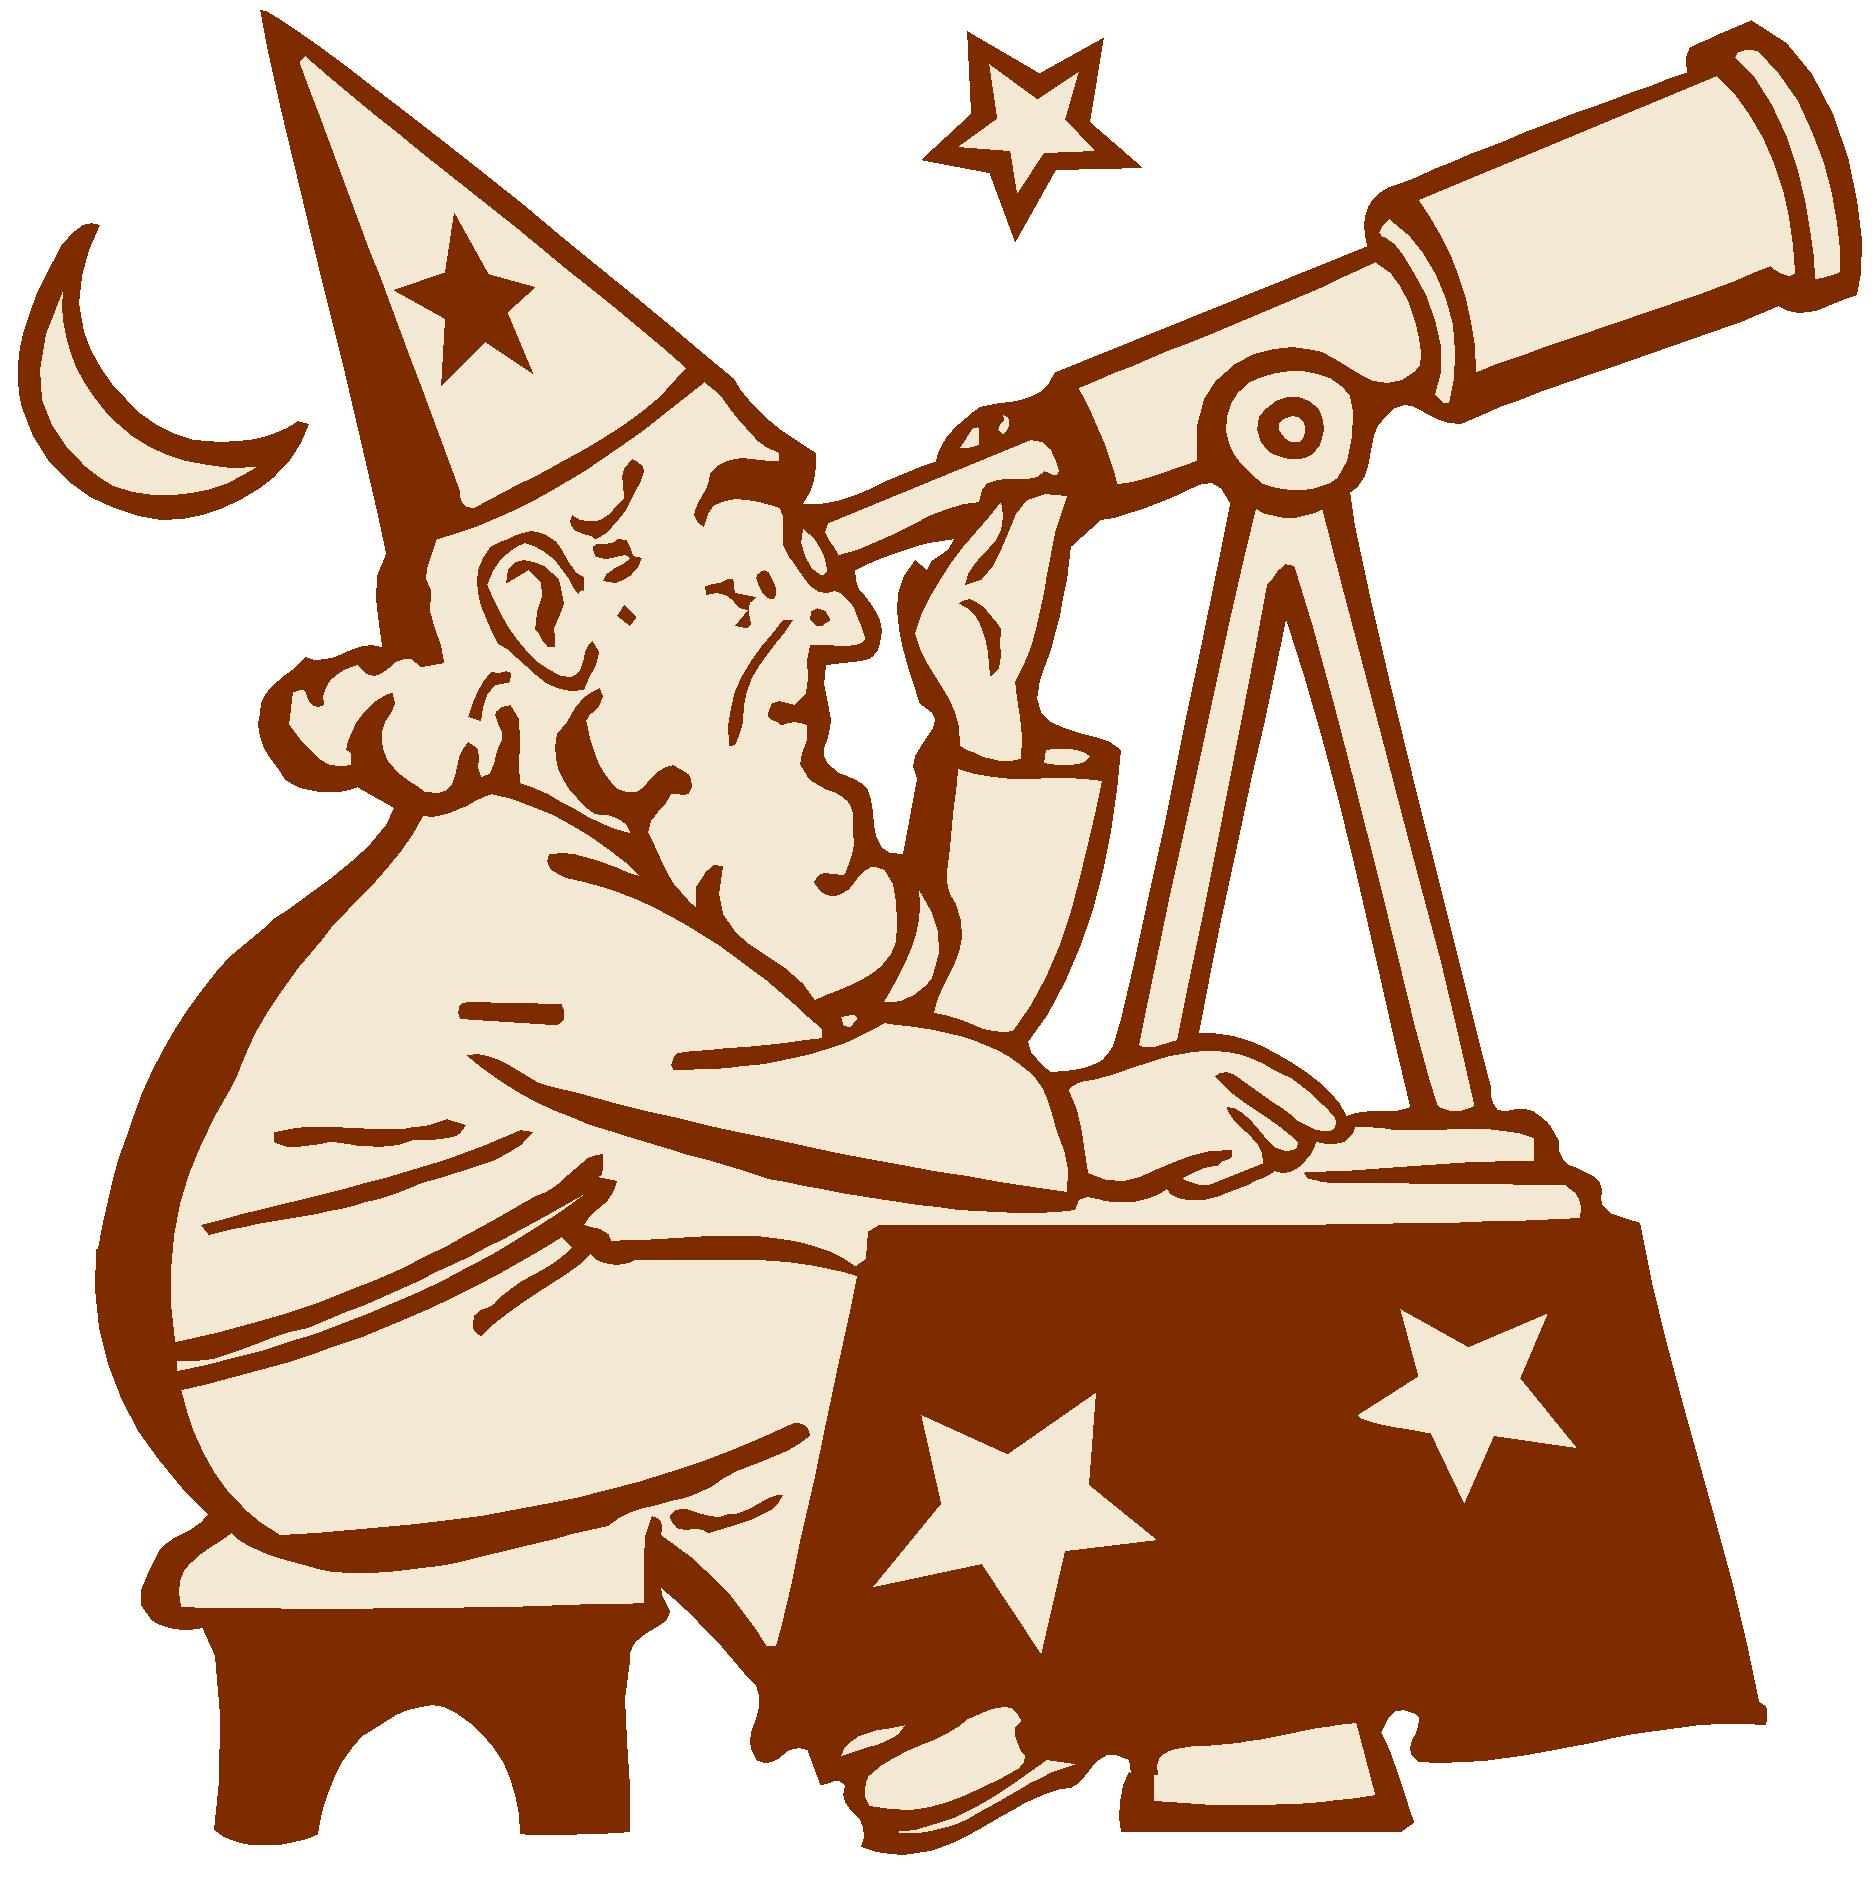 Астрономия картинки для детей